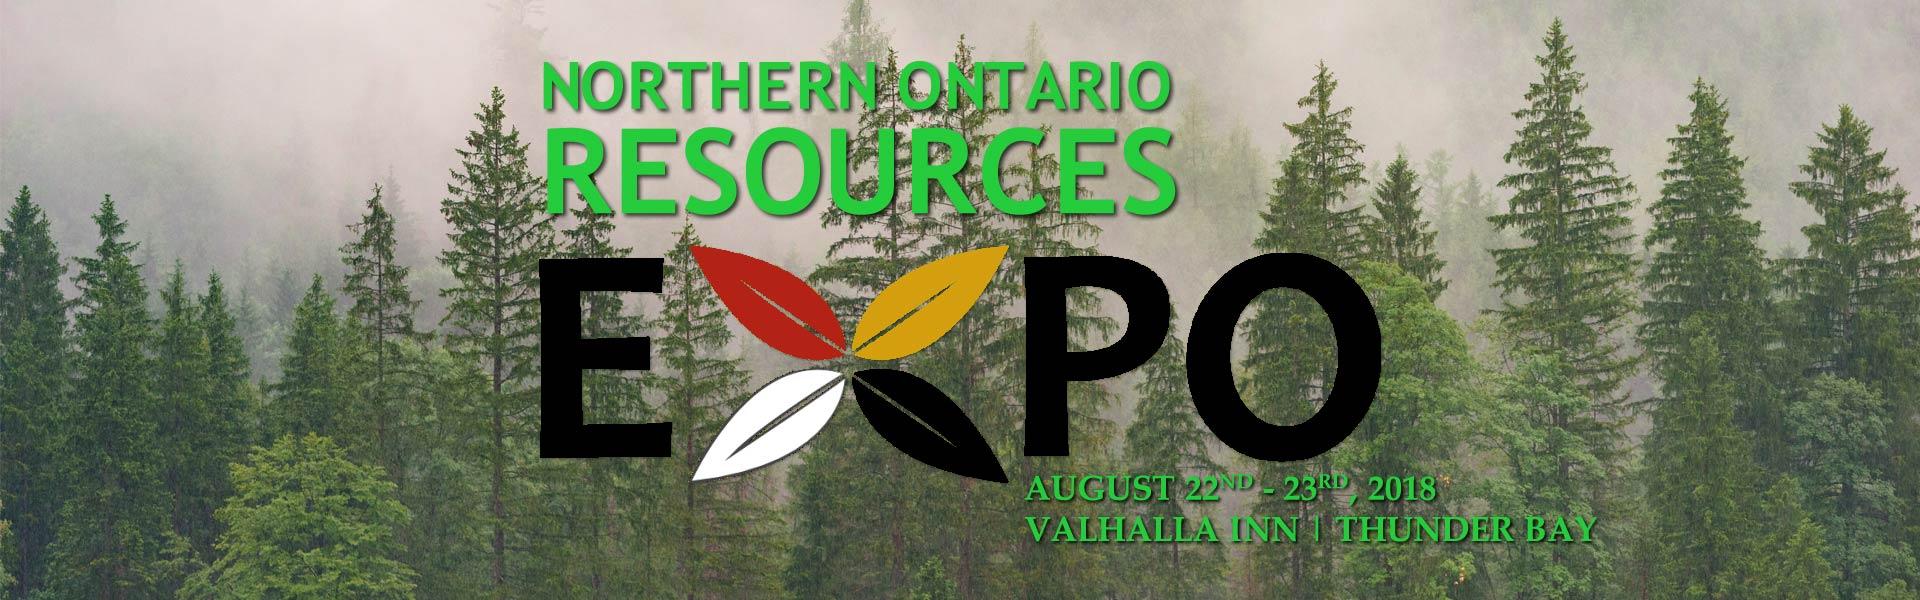 Northern Ontario Resource Expo